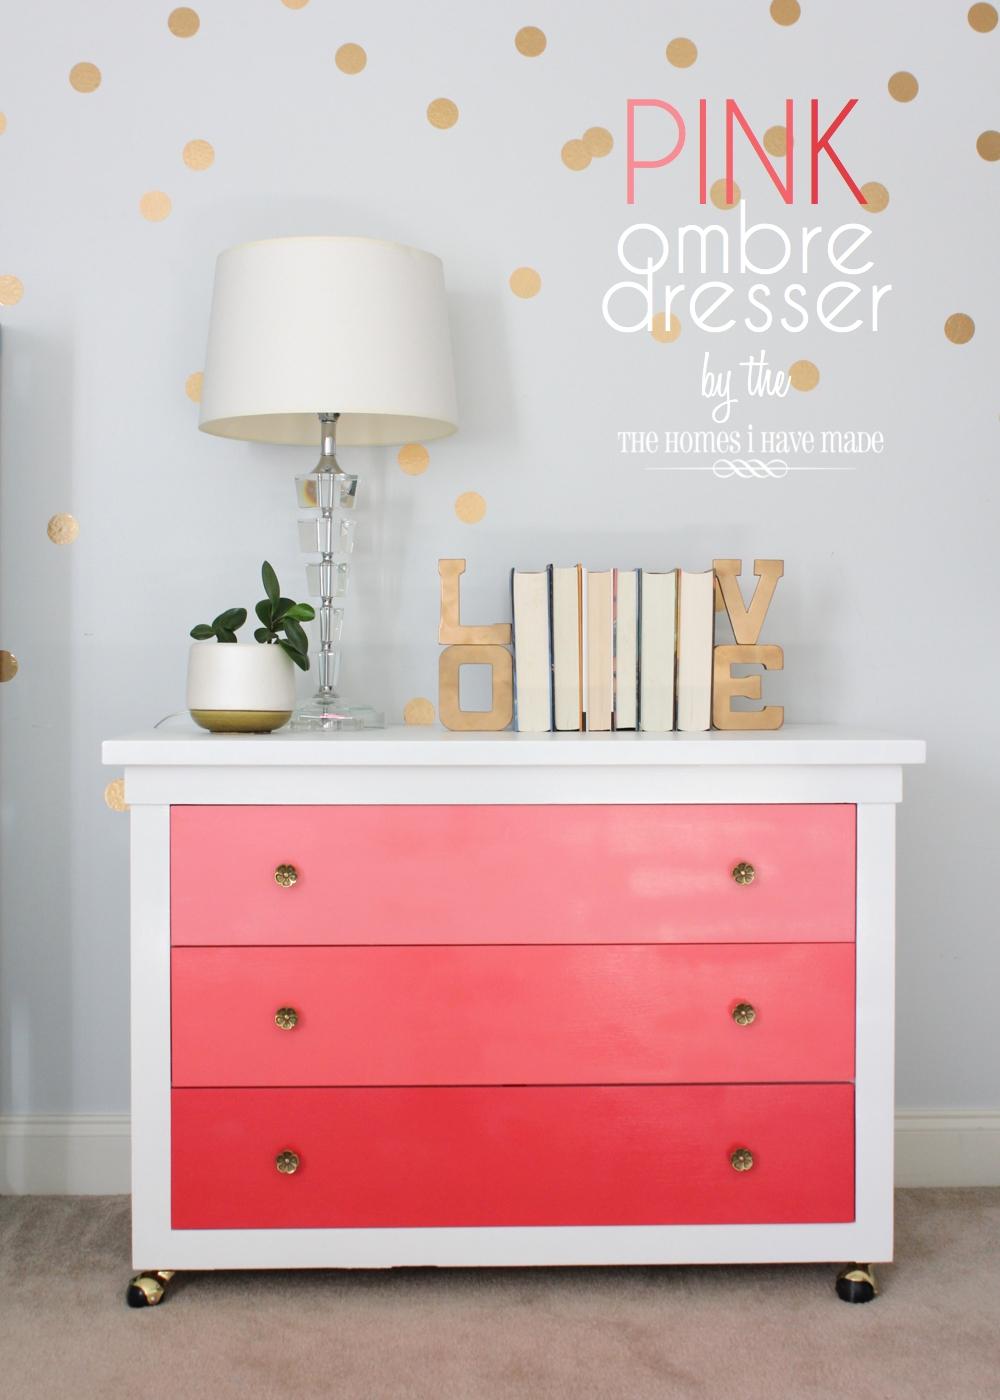 Pink Ombre Dresser-022